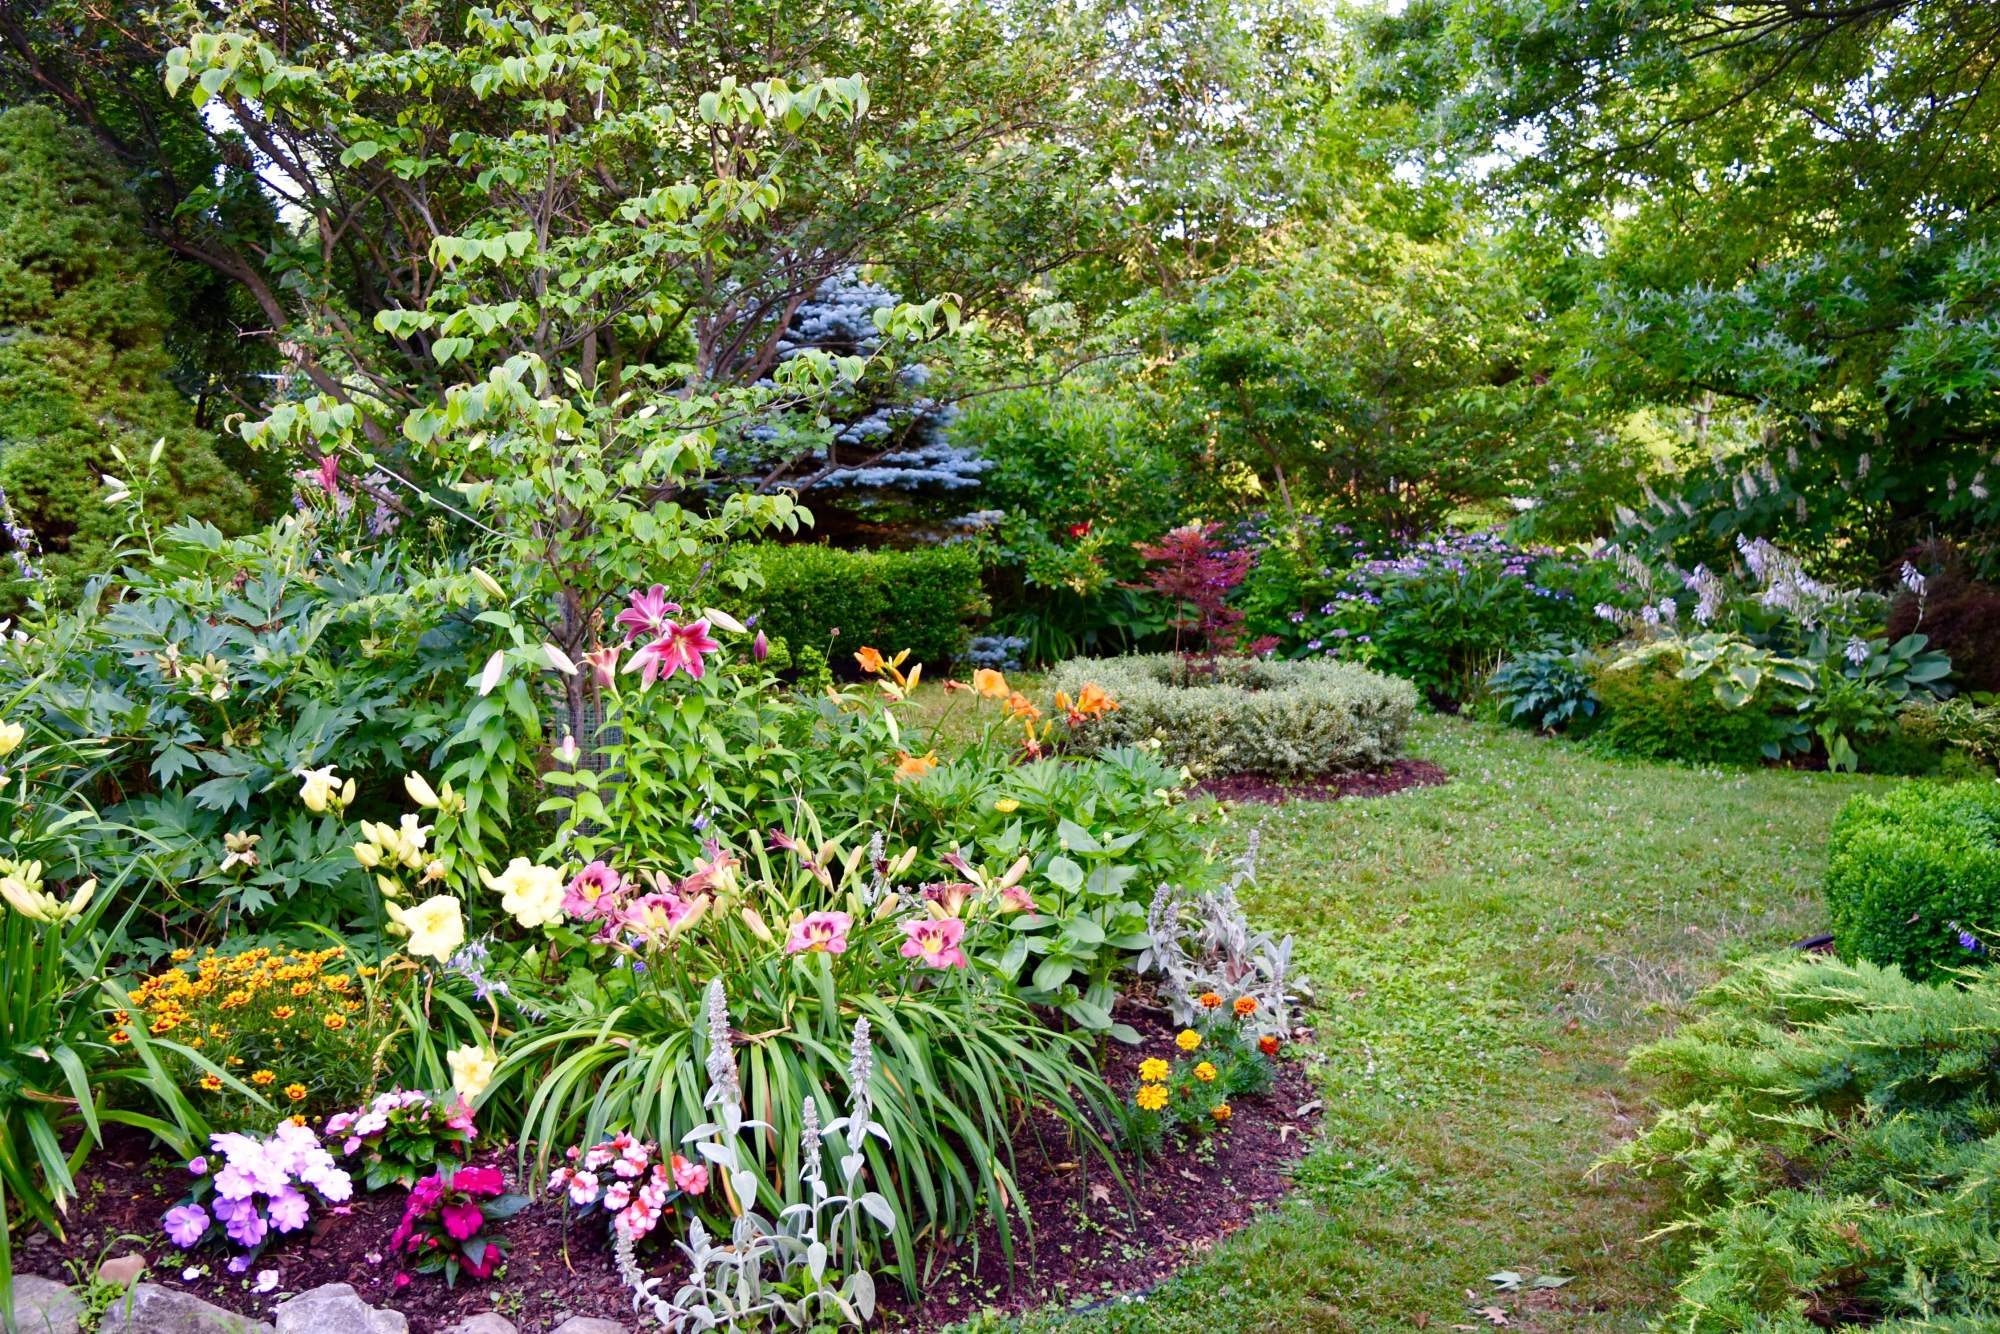 Press Kit About Gardens Buffalo Niagara Buffalo Ny Small Backyard Gardens Garden Planning Layout Gardening Photography